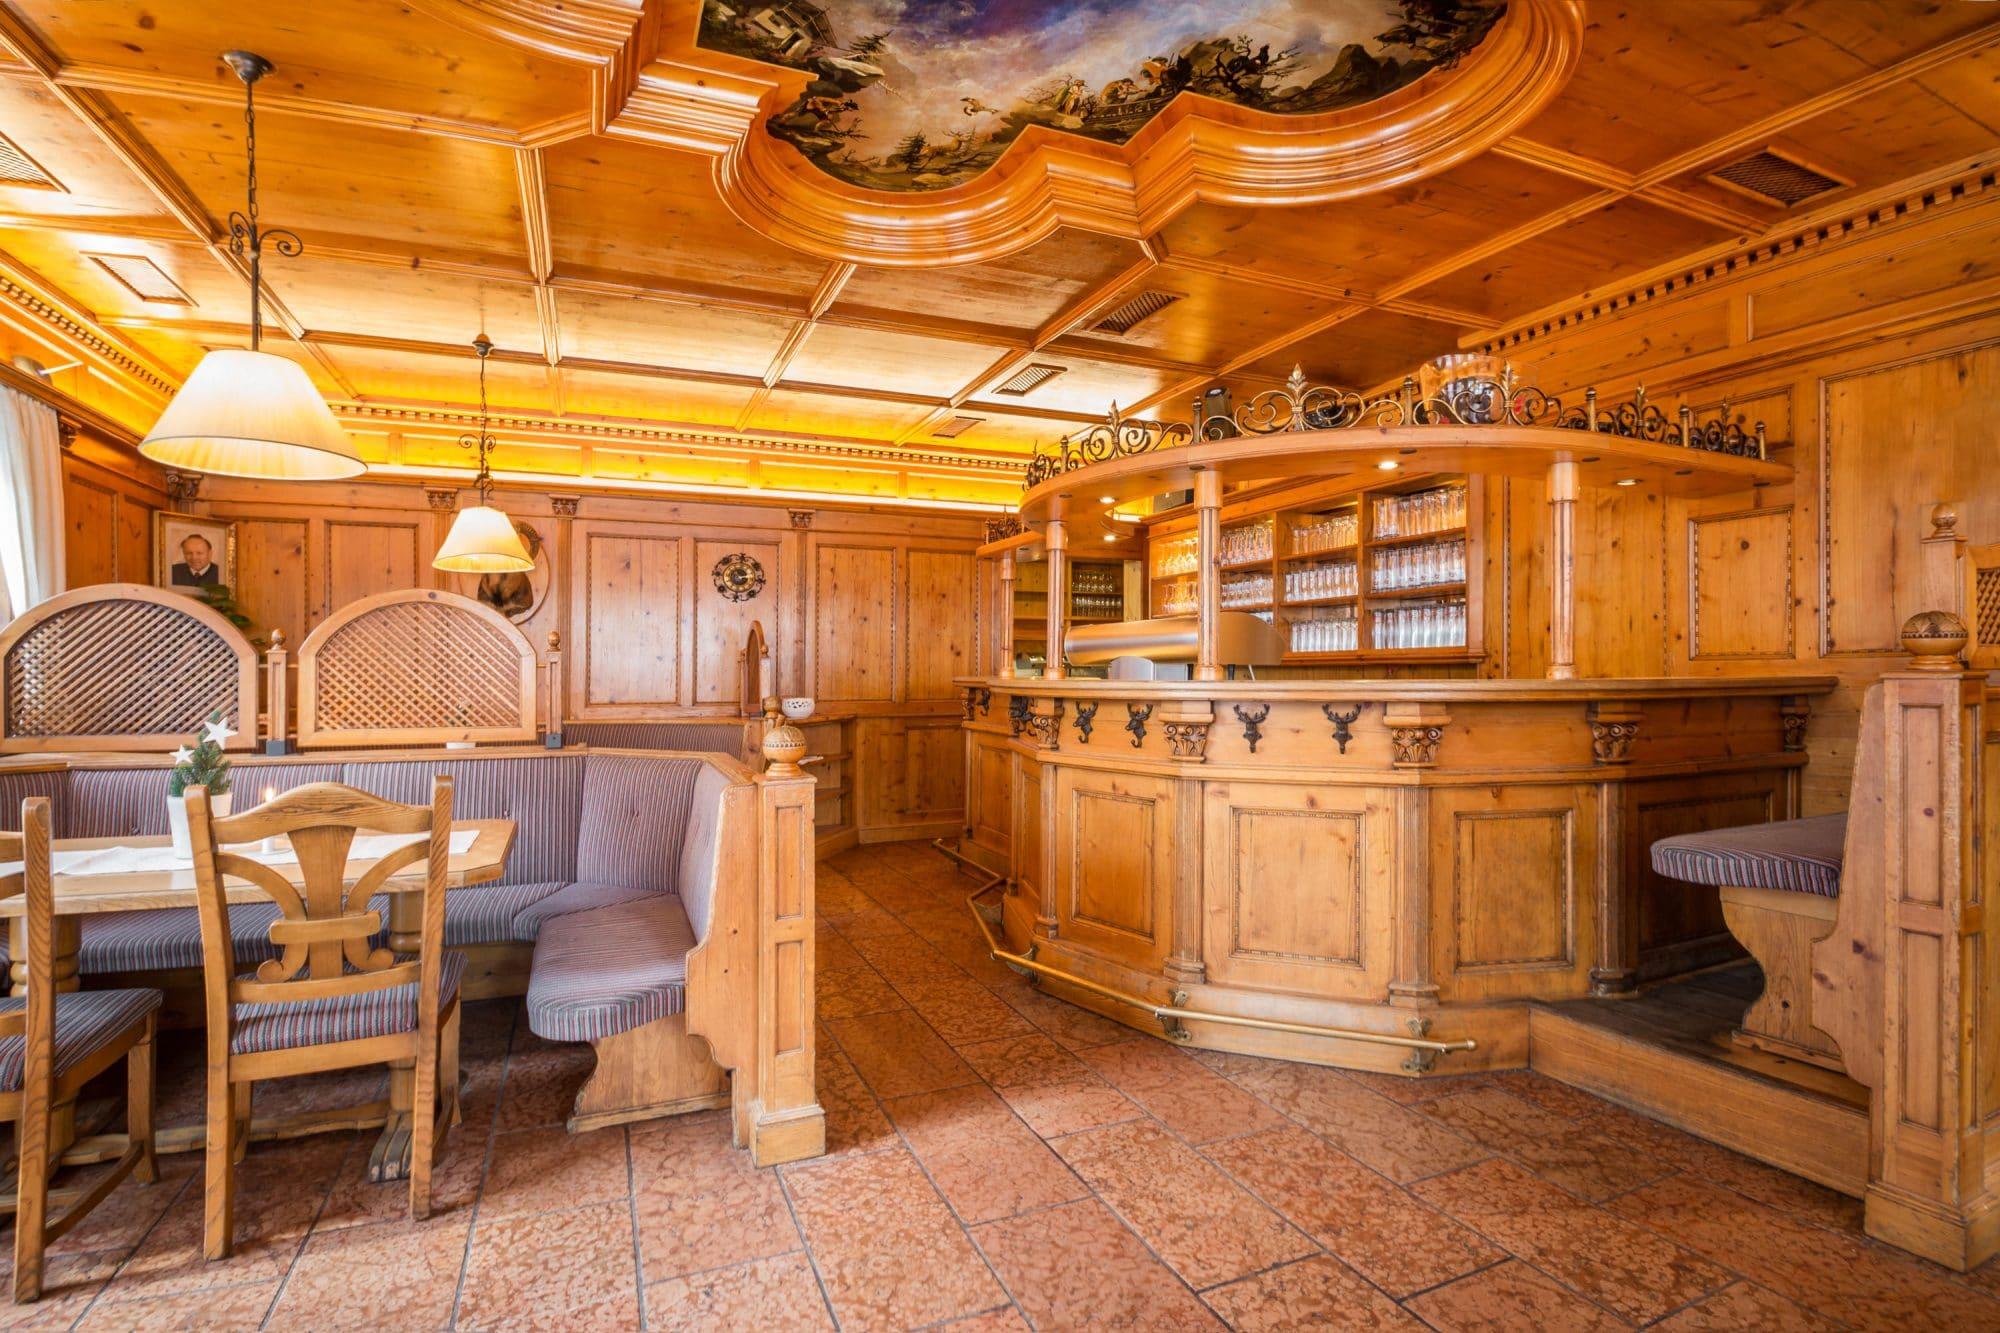 07-Gaststube-Bar-Feiern